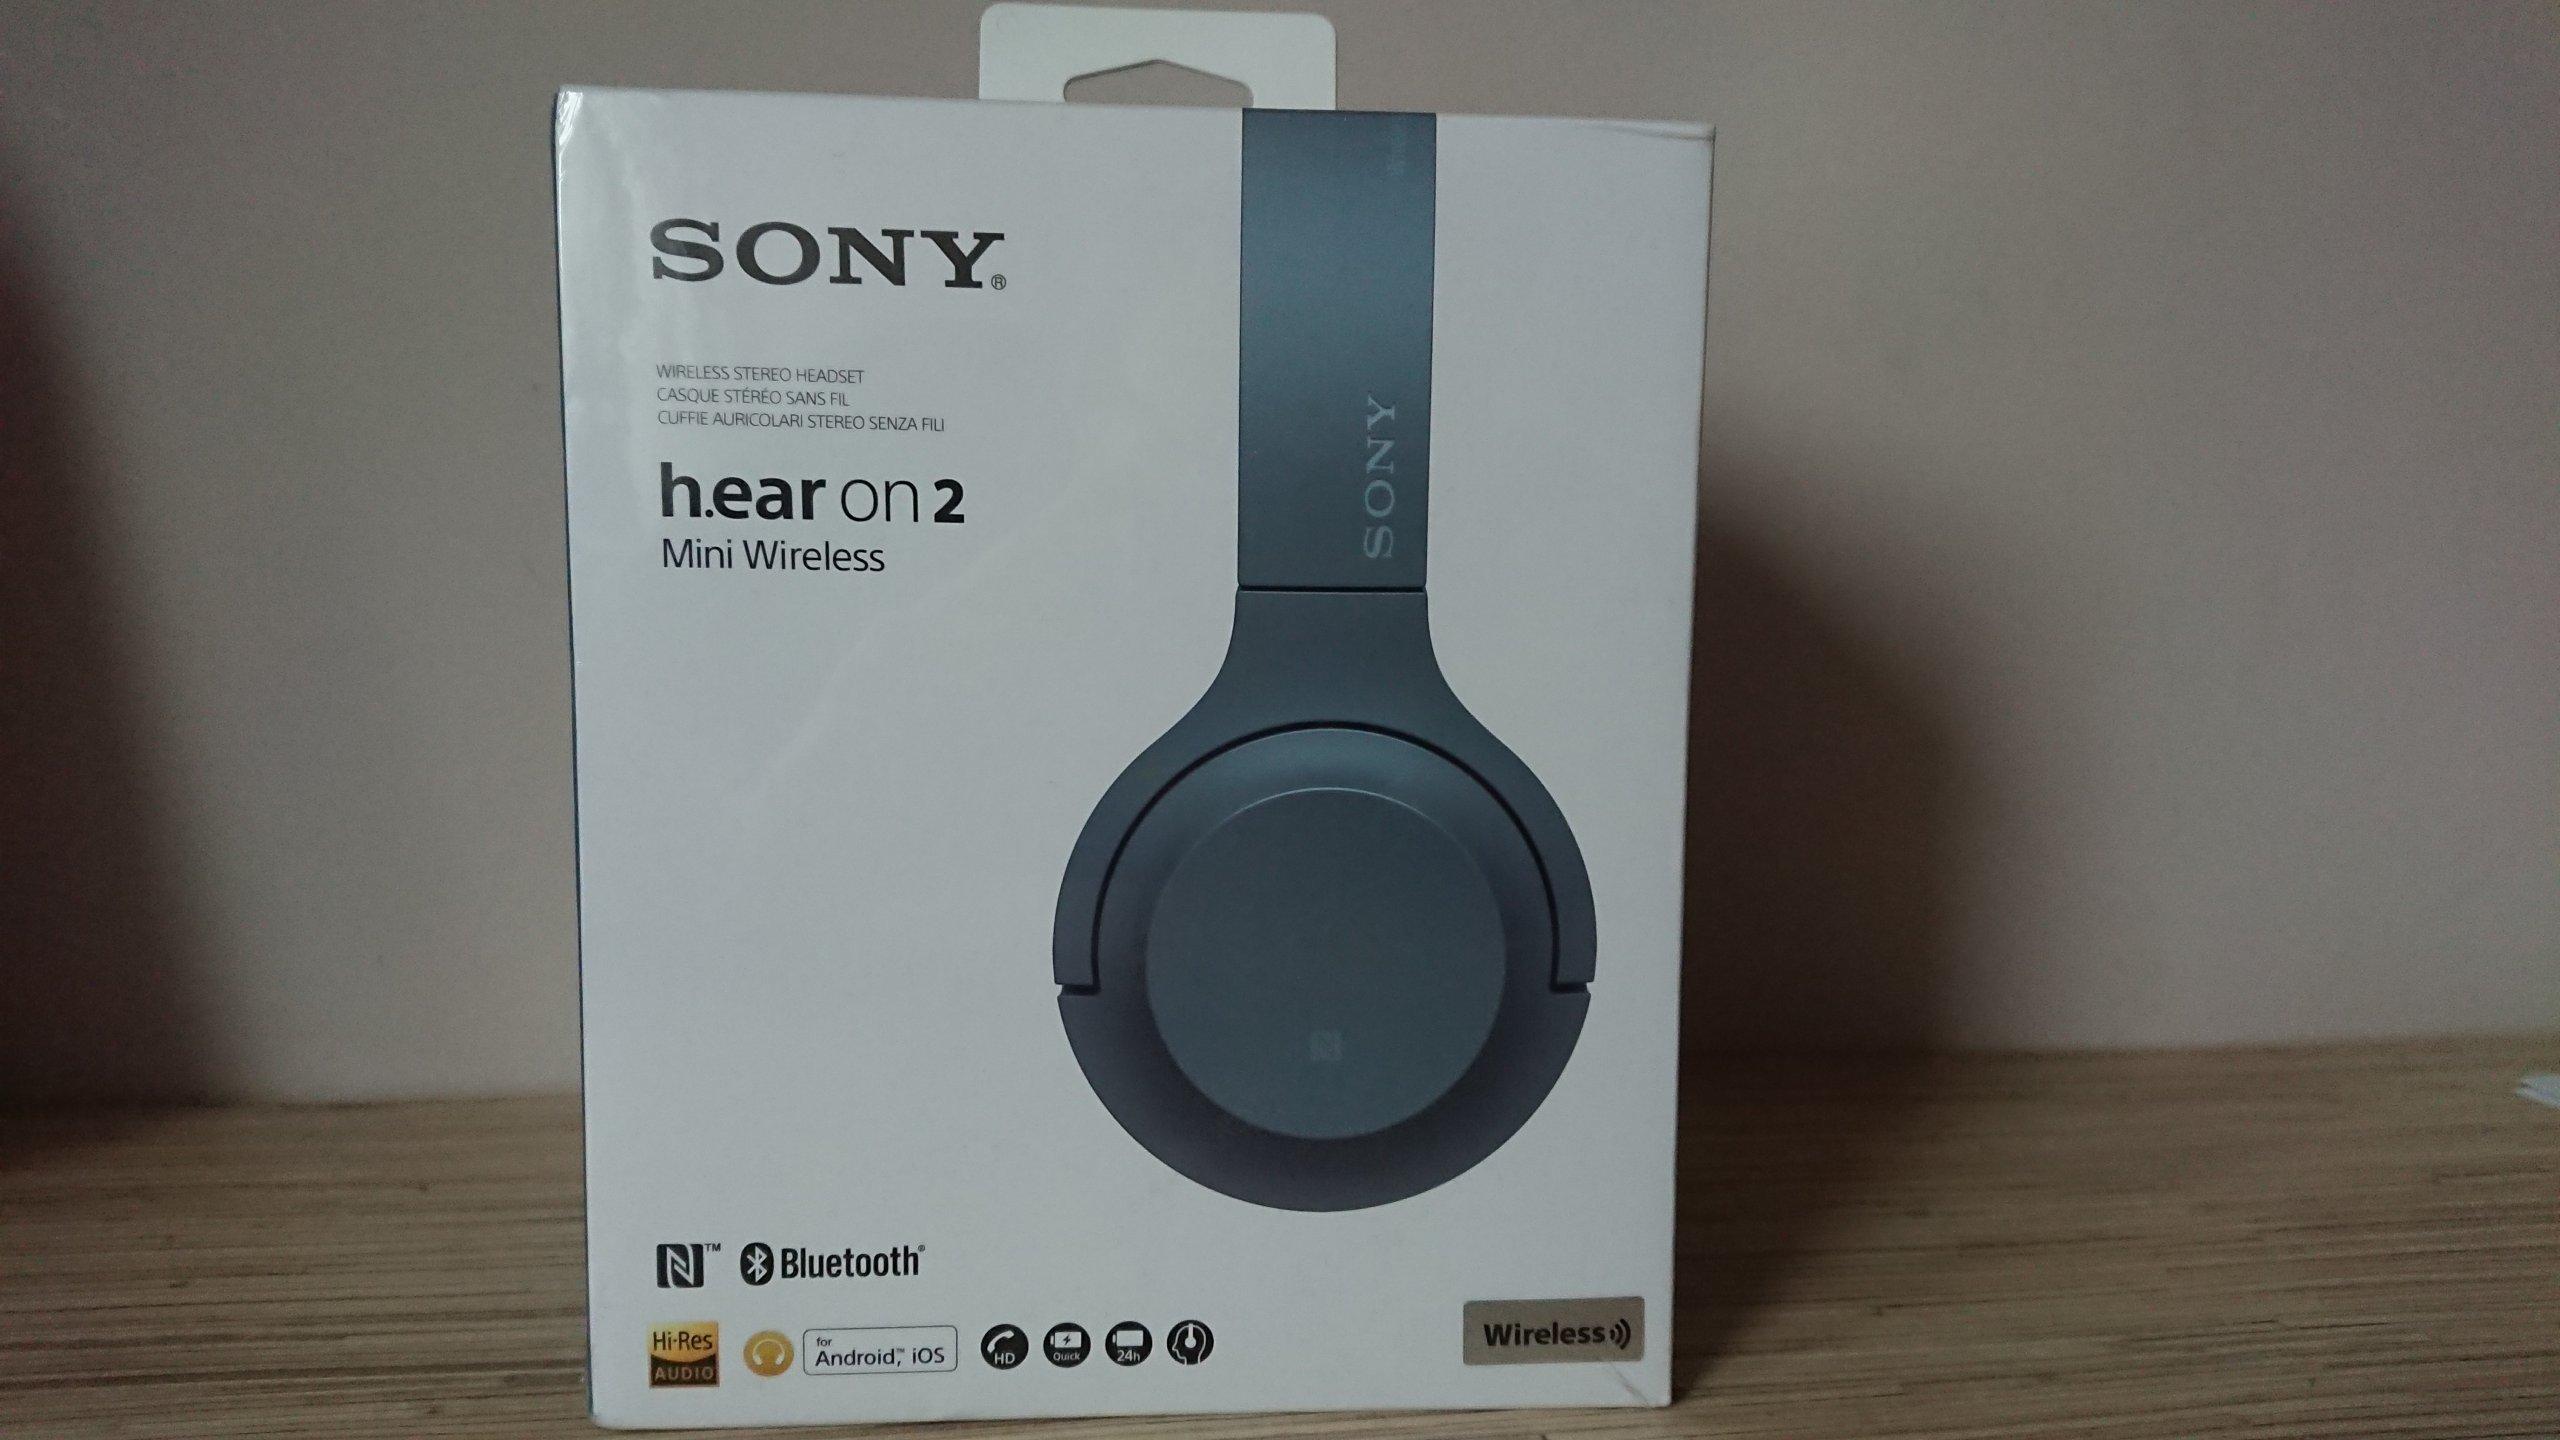 Sony h.ear on 2 Mini wireless WH-H800 - 7219138657 - oficjalne ... 92bfb03d380d